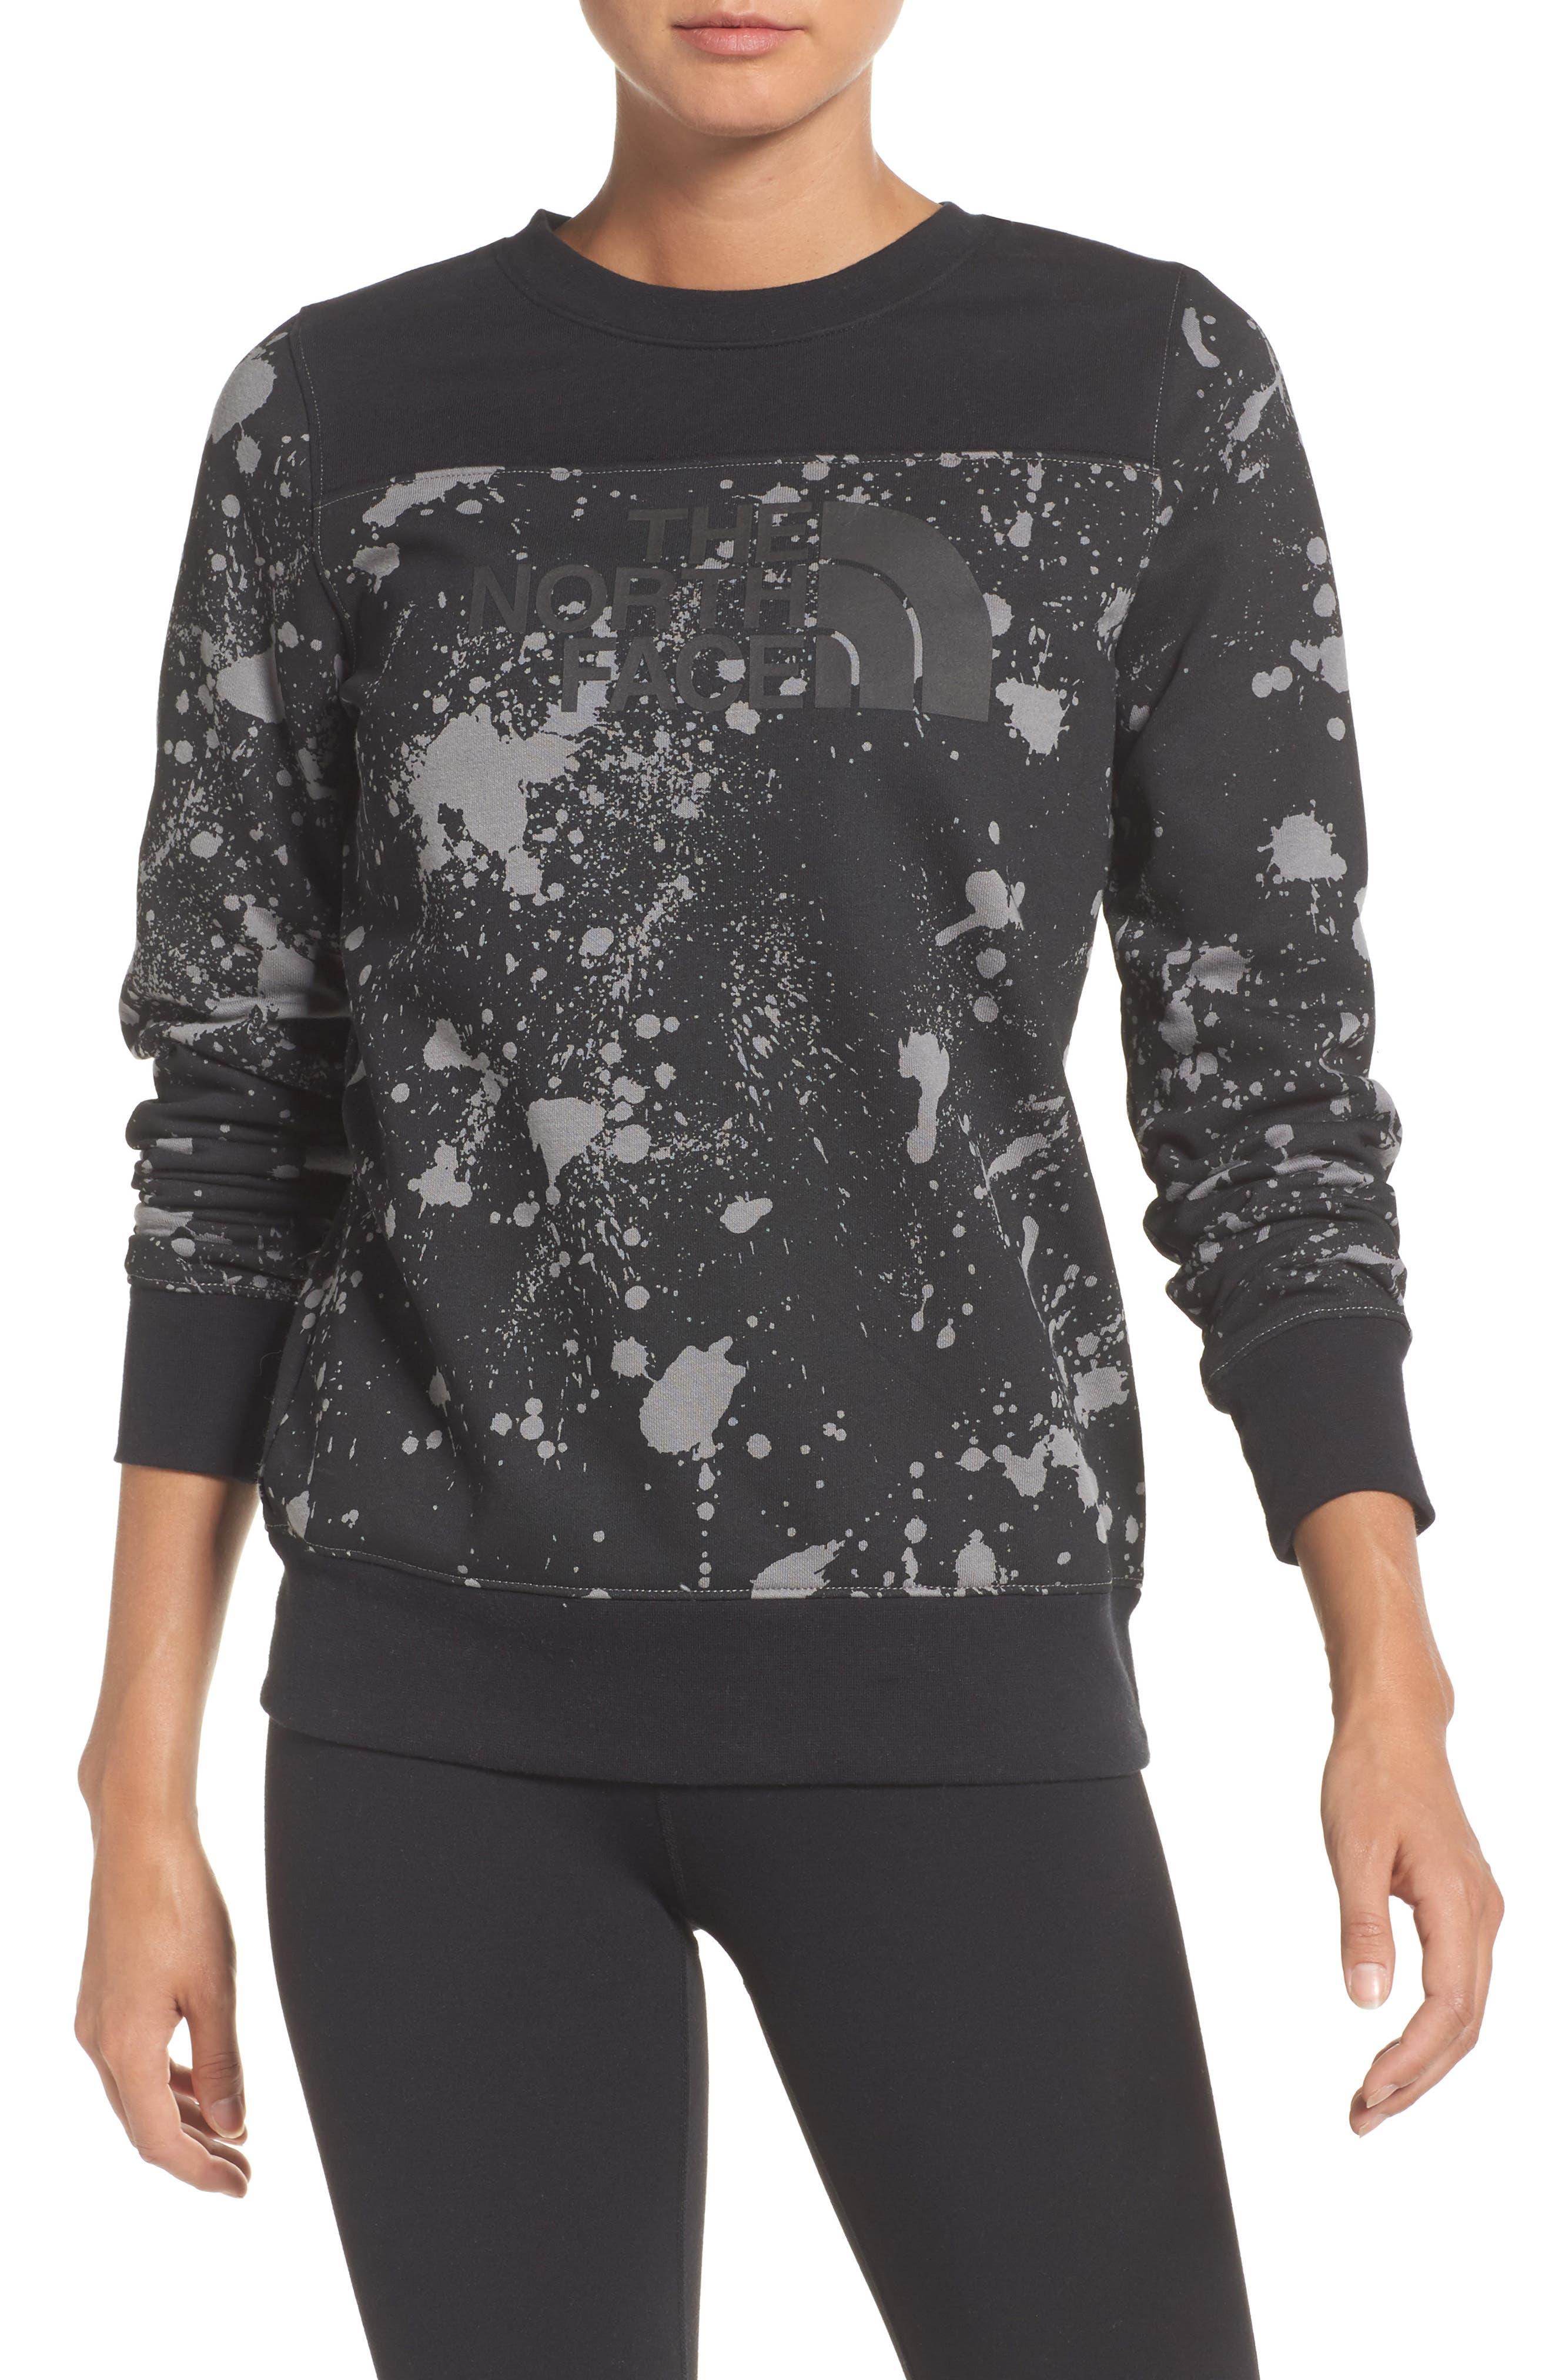 Half Dome Sweatshirt,                             Main thumbnail 1, color,                             Tnf Black Splatter Print